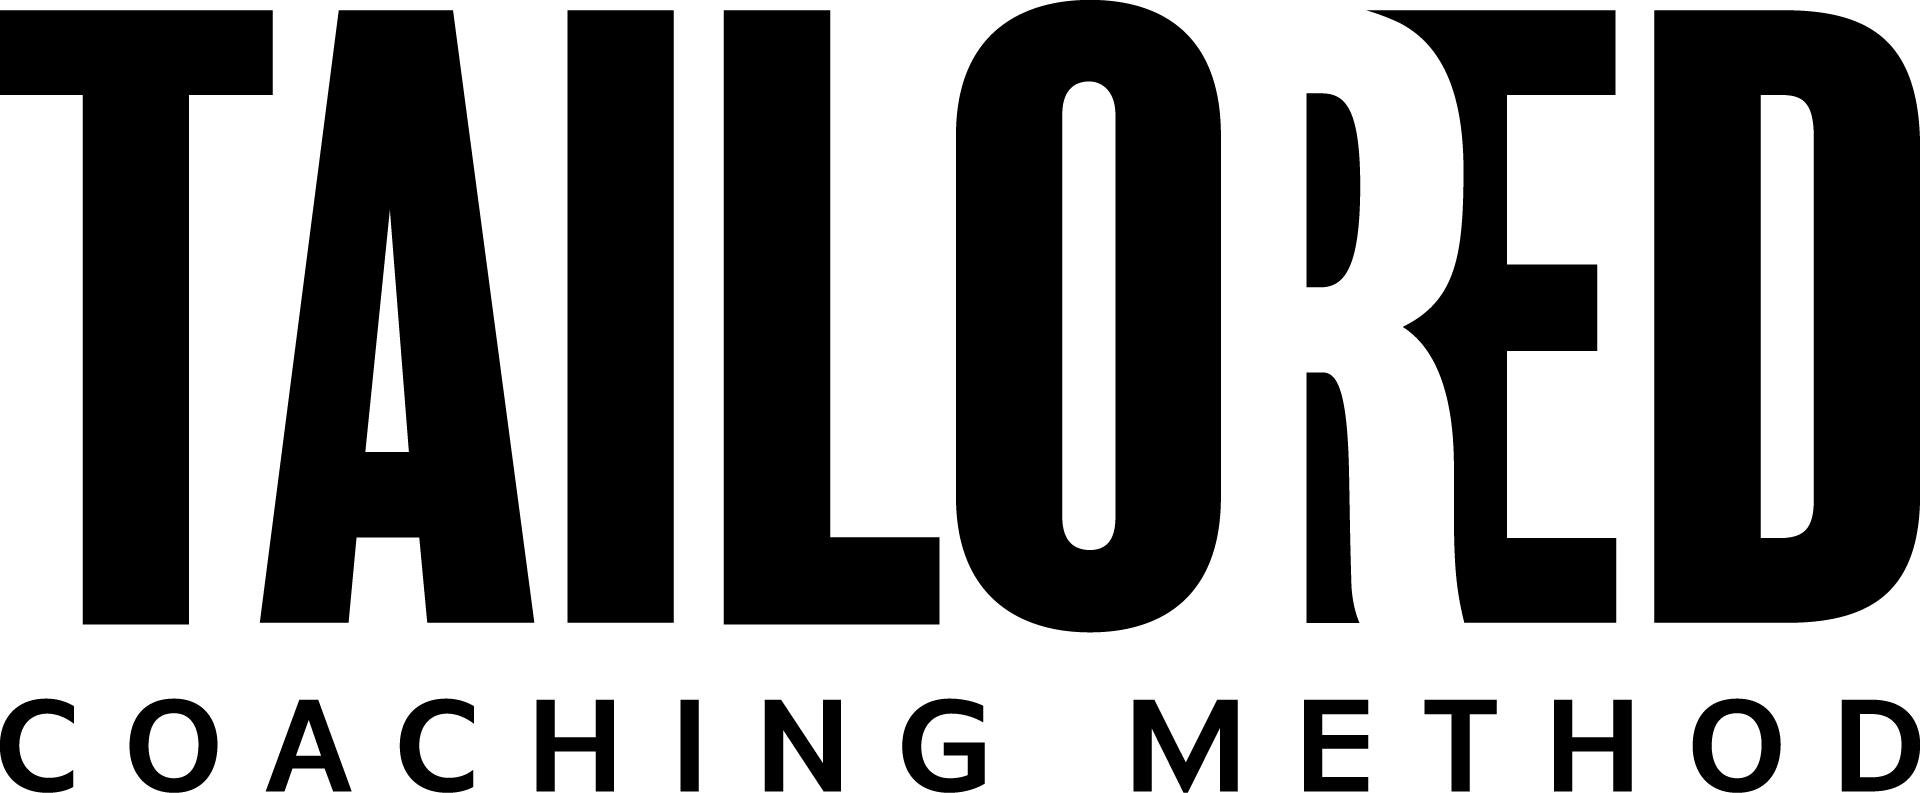 https://rockstarcoding.com/wp-content/uploads/2020/06/TCM-Logo-Black.png